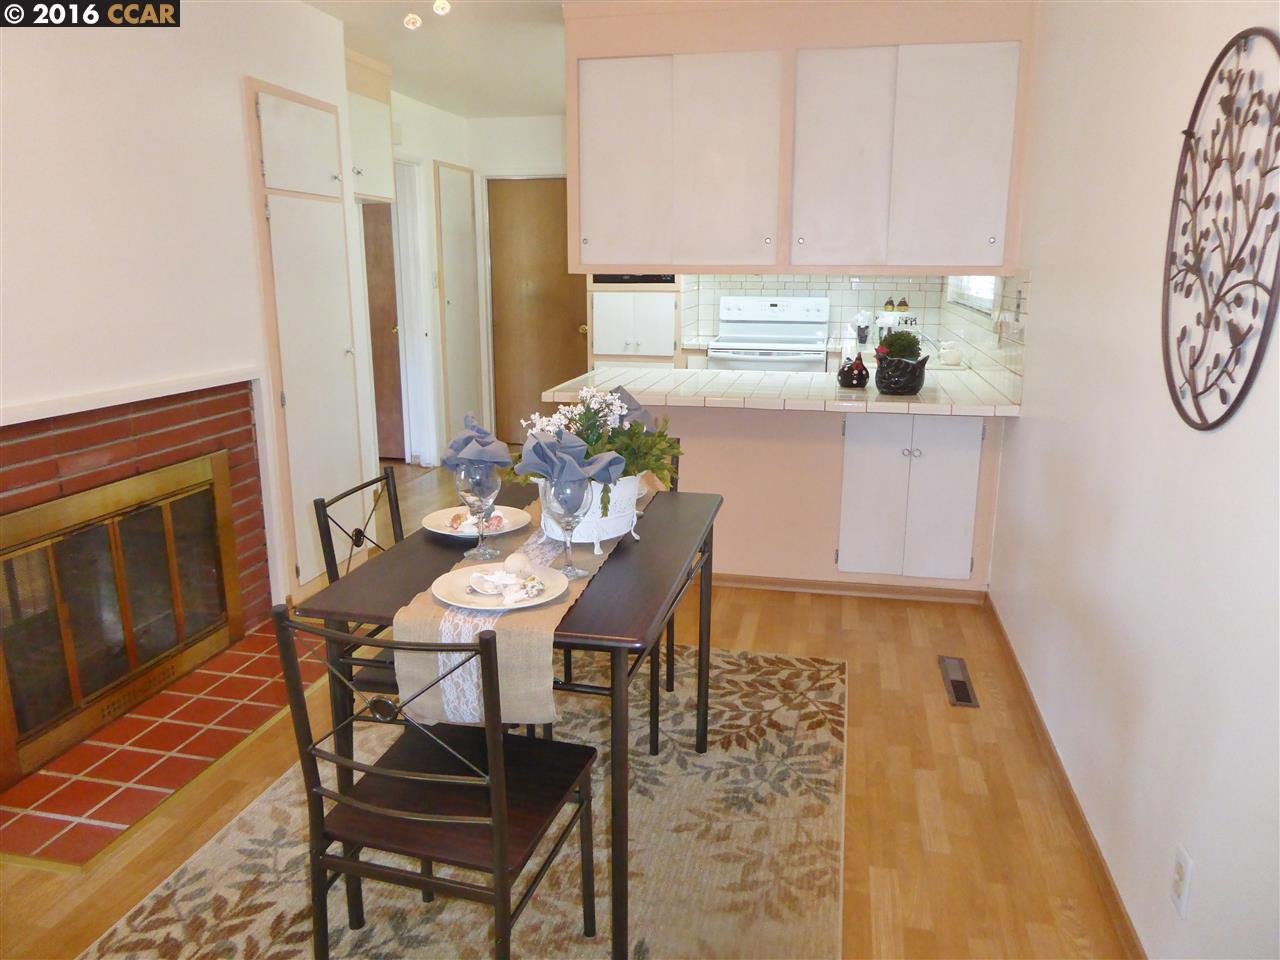 Additional photo for property listing at 402 MACKENZIE Place  Hayward, California 94544 United States